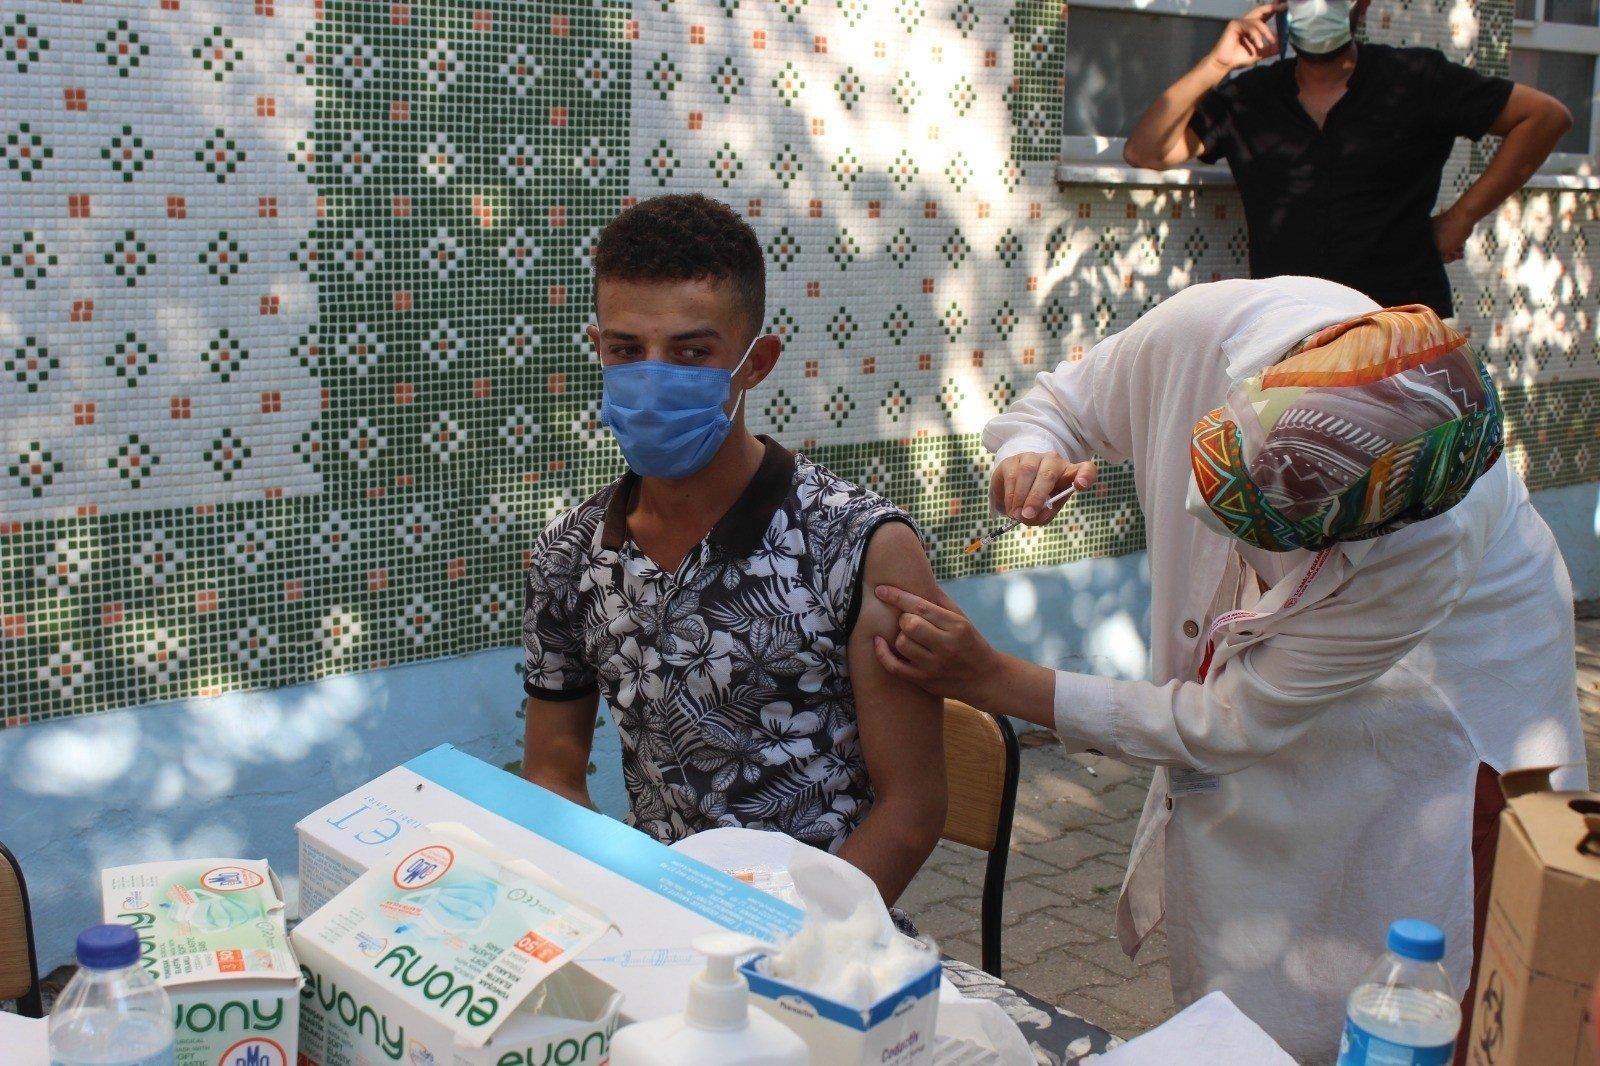 A man gets vaccinated against COVID-19, in Bilecik, western Turkey, Aug. 20, 2021. (IHA PHOTO)